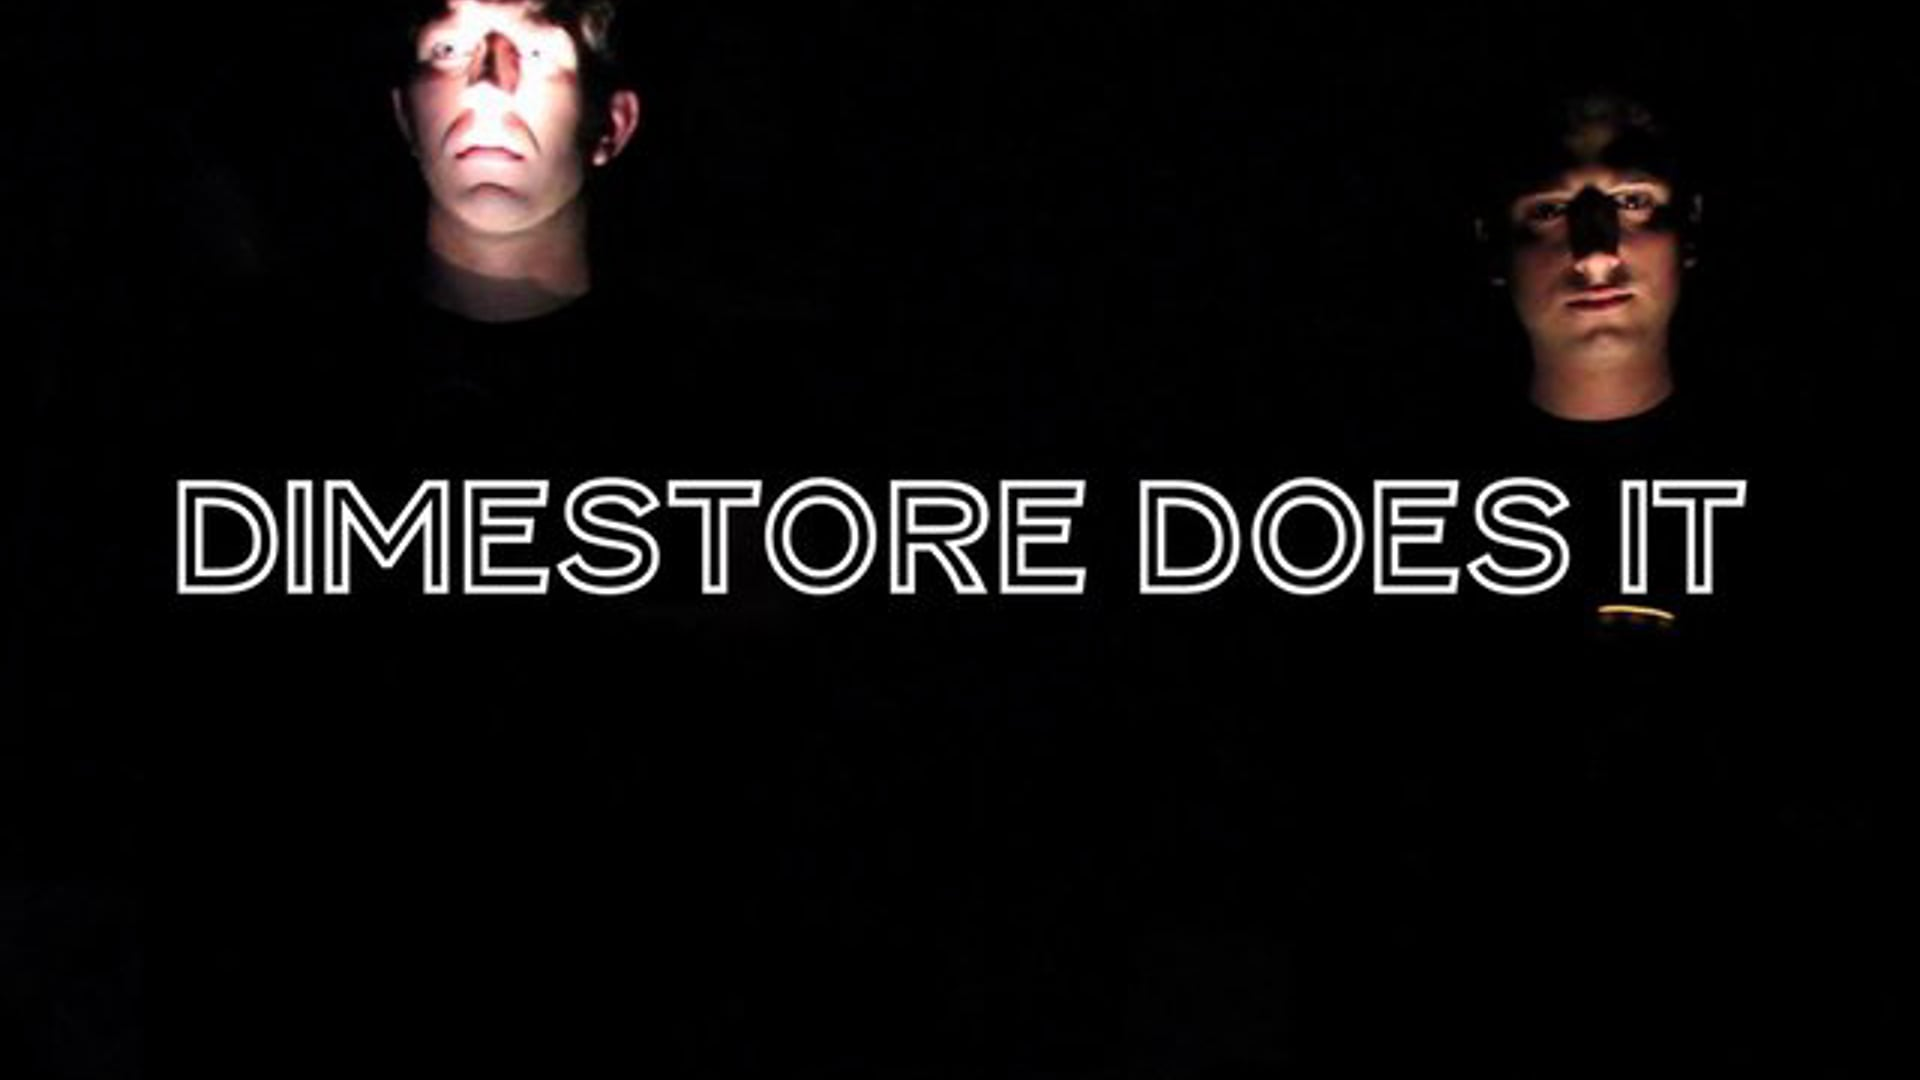 DimeStore Does It: Dream Interpretation